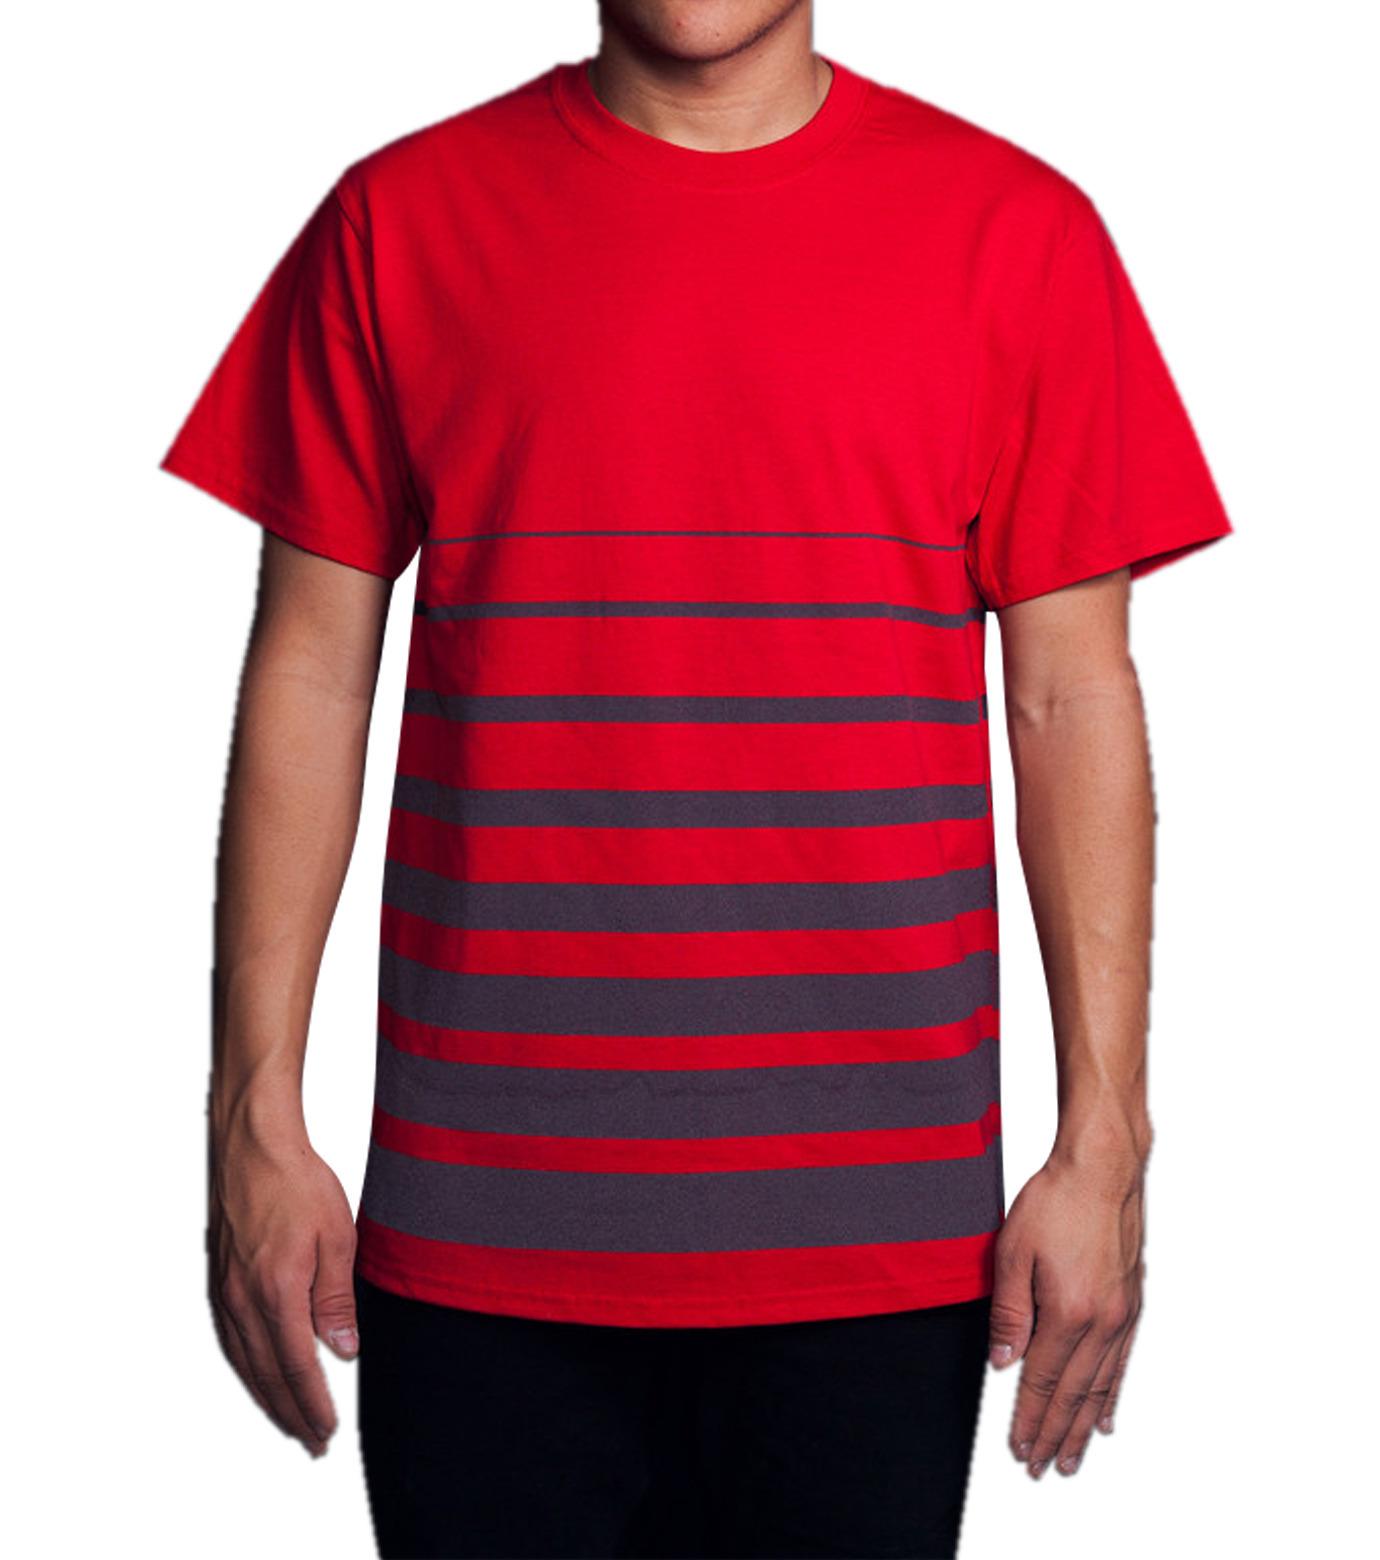 ICNY(アイ・シー・エヌ・ワイ)のGradient T-shirts-RED(T-SHIRTS/T-SHIRTS)-GRDT-62 拡大詳細画像3